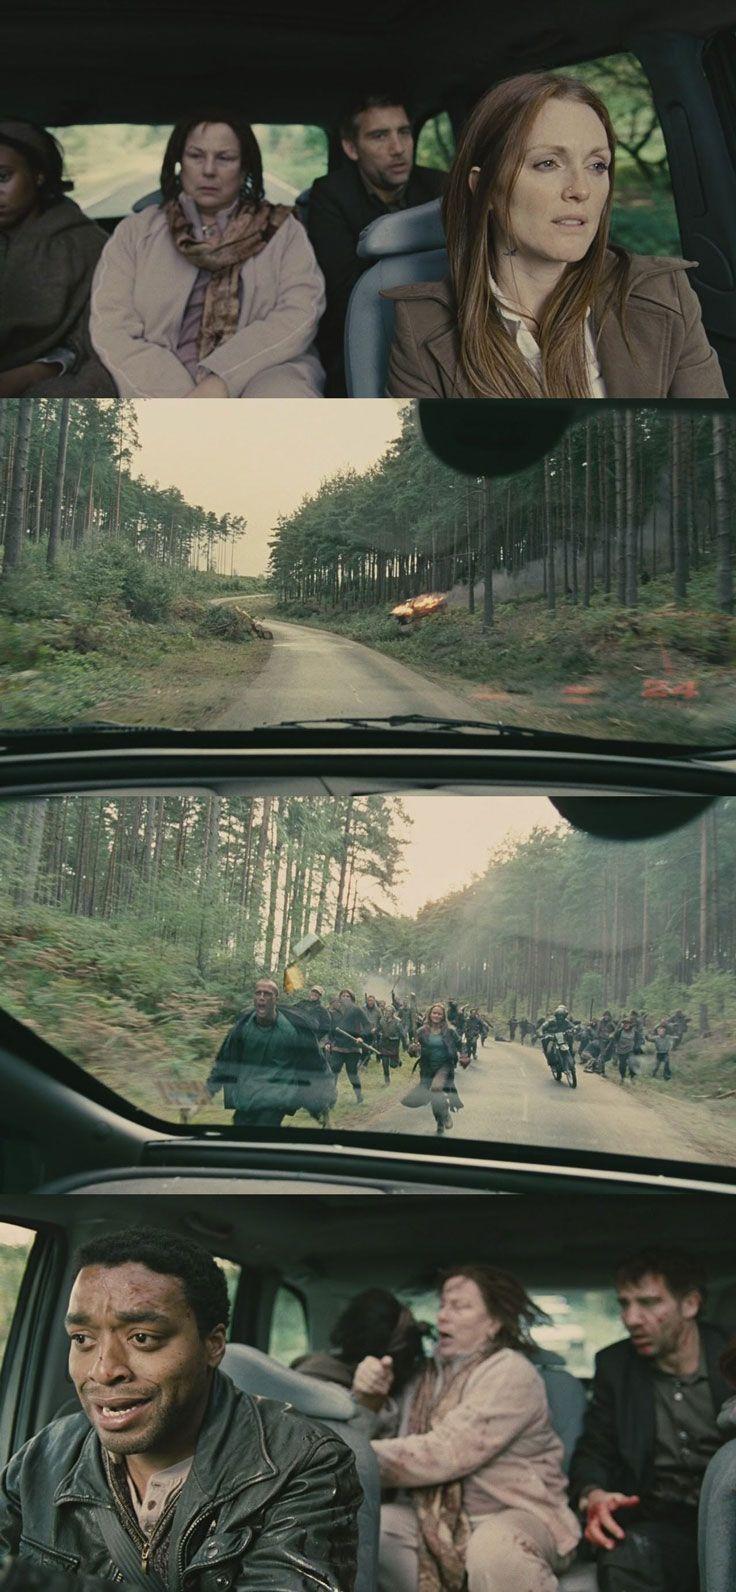 Thrilling single-shot sequence: the road ambush in Children of Men (2006). Cinematography by Emmanuel Lubezki.